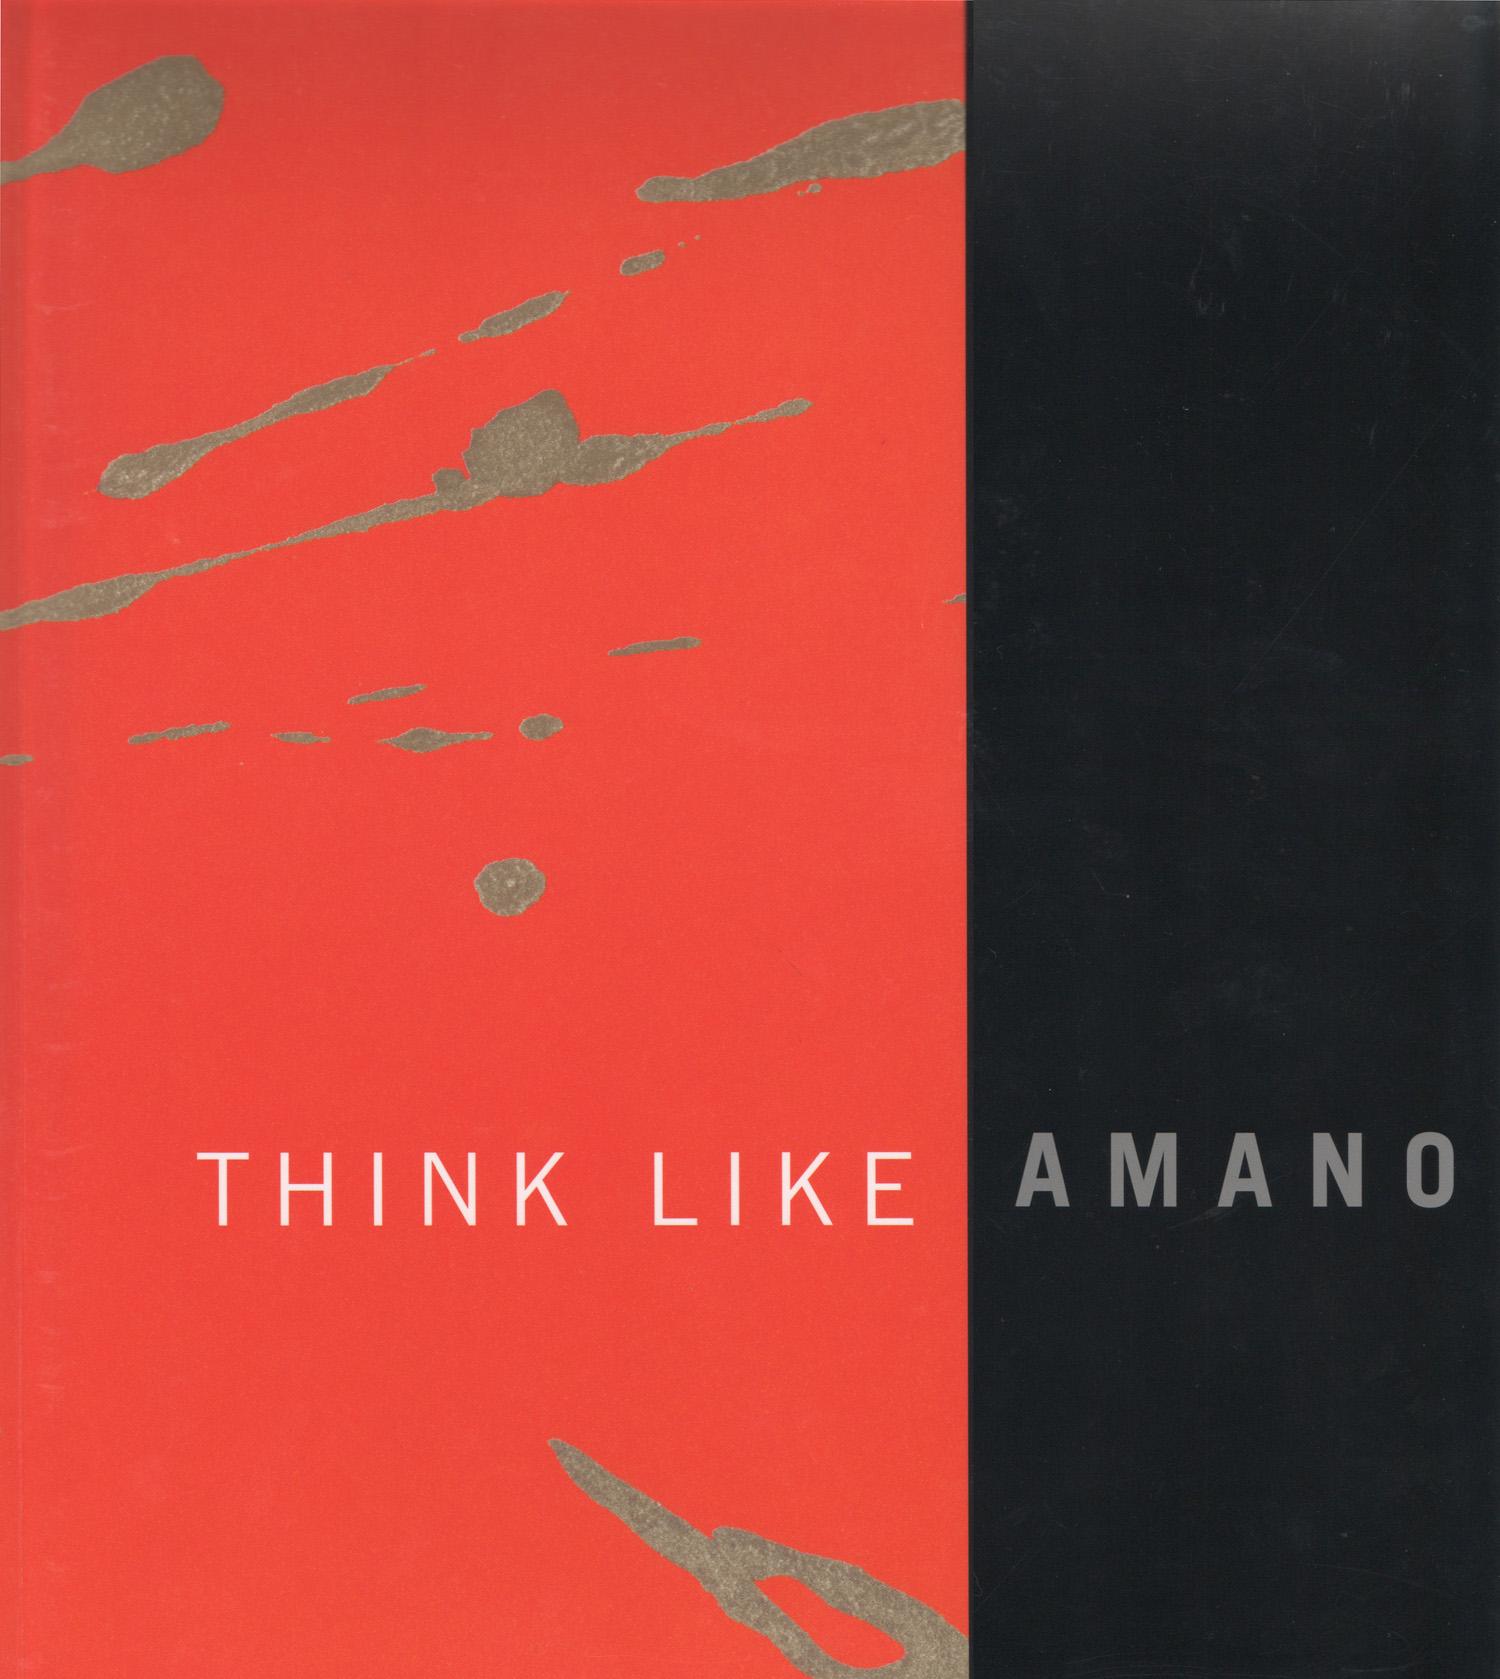 THINK LIKE AMANO - 1997 Soho, New York